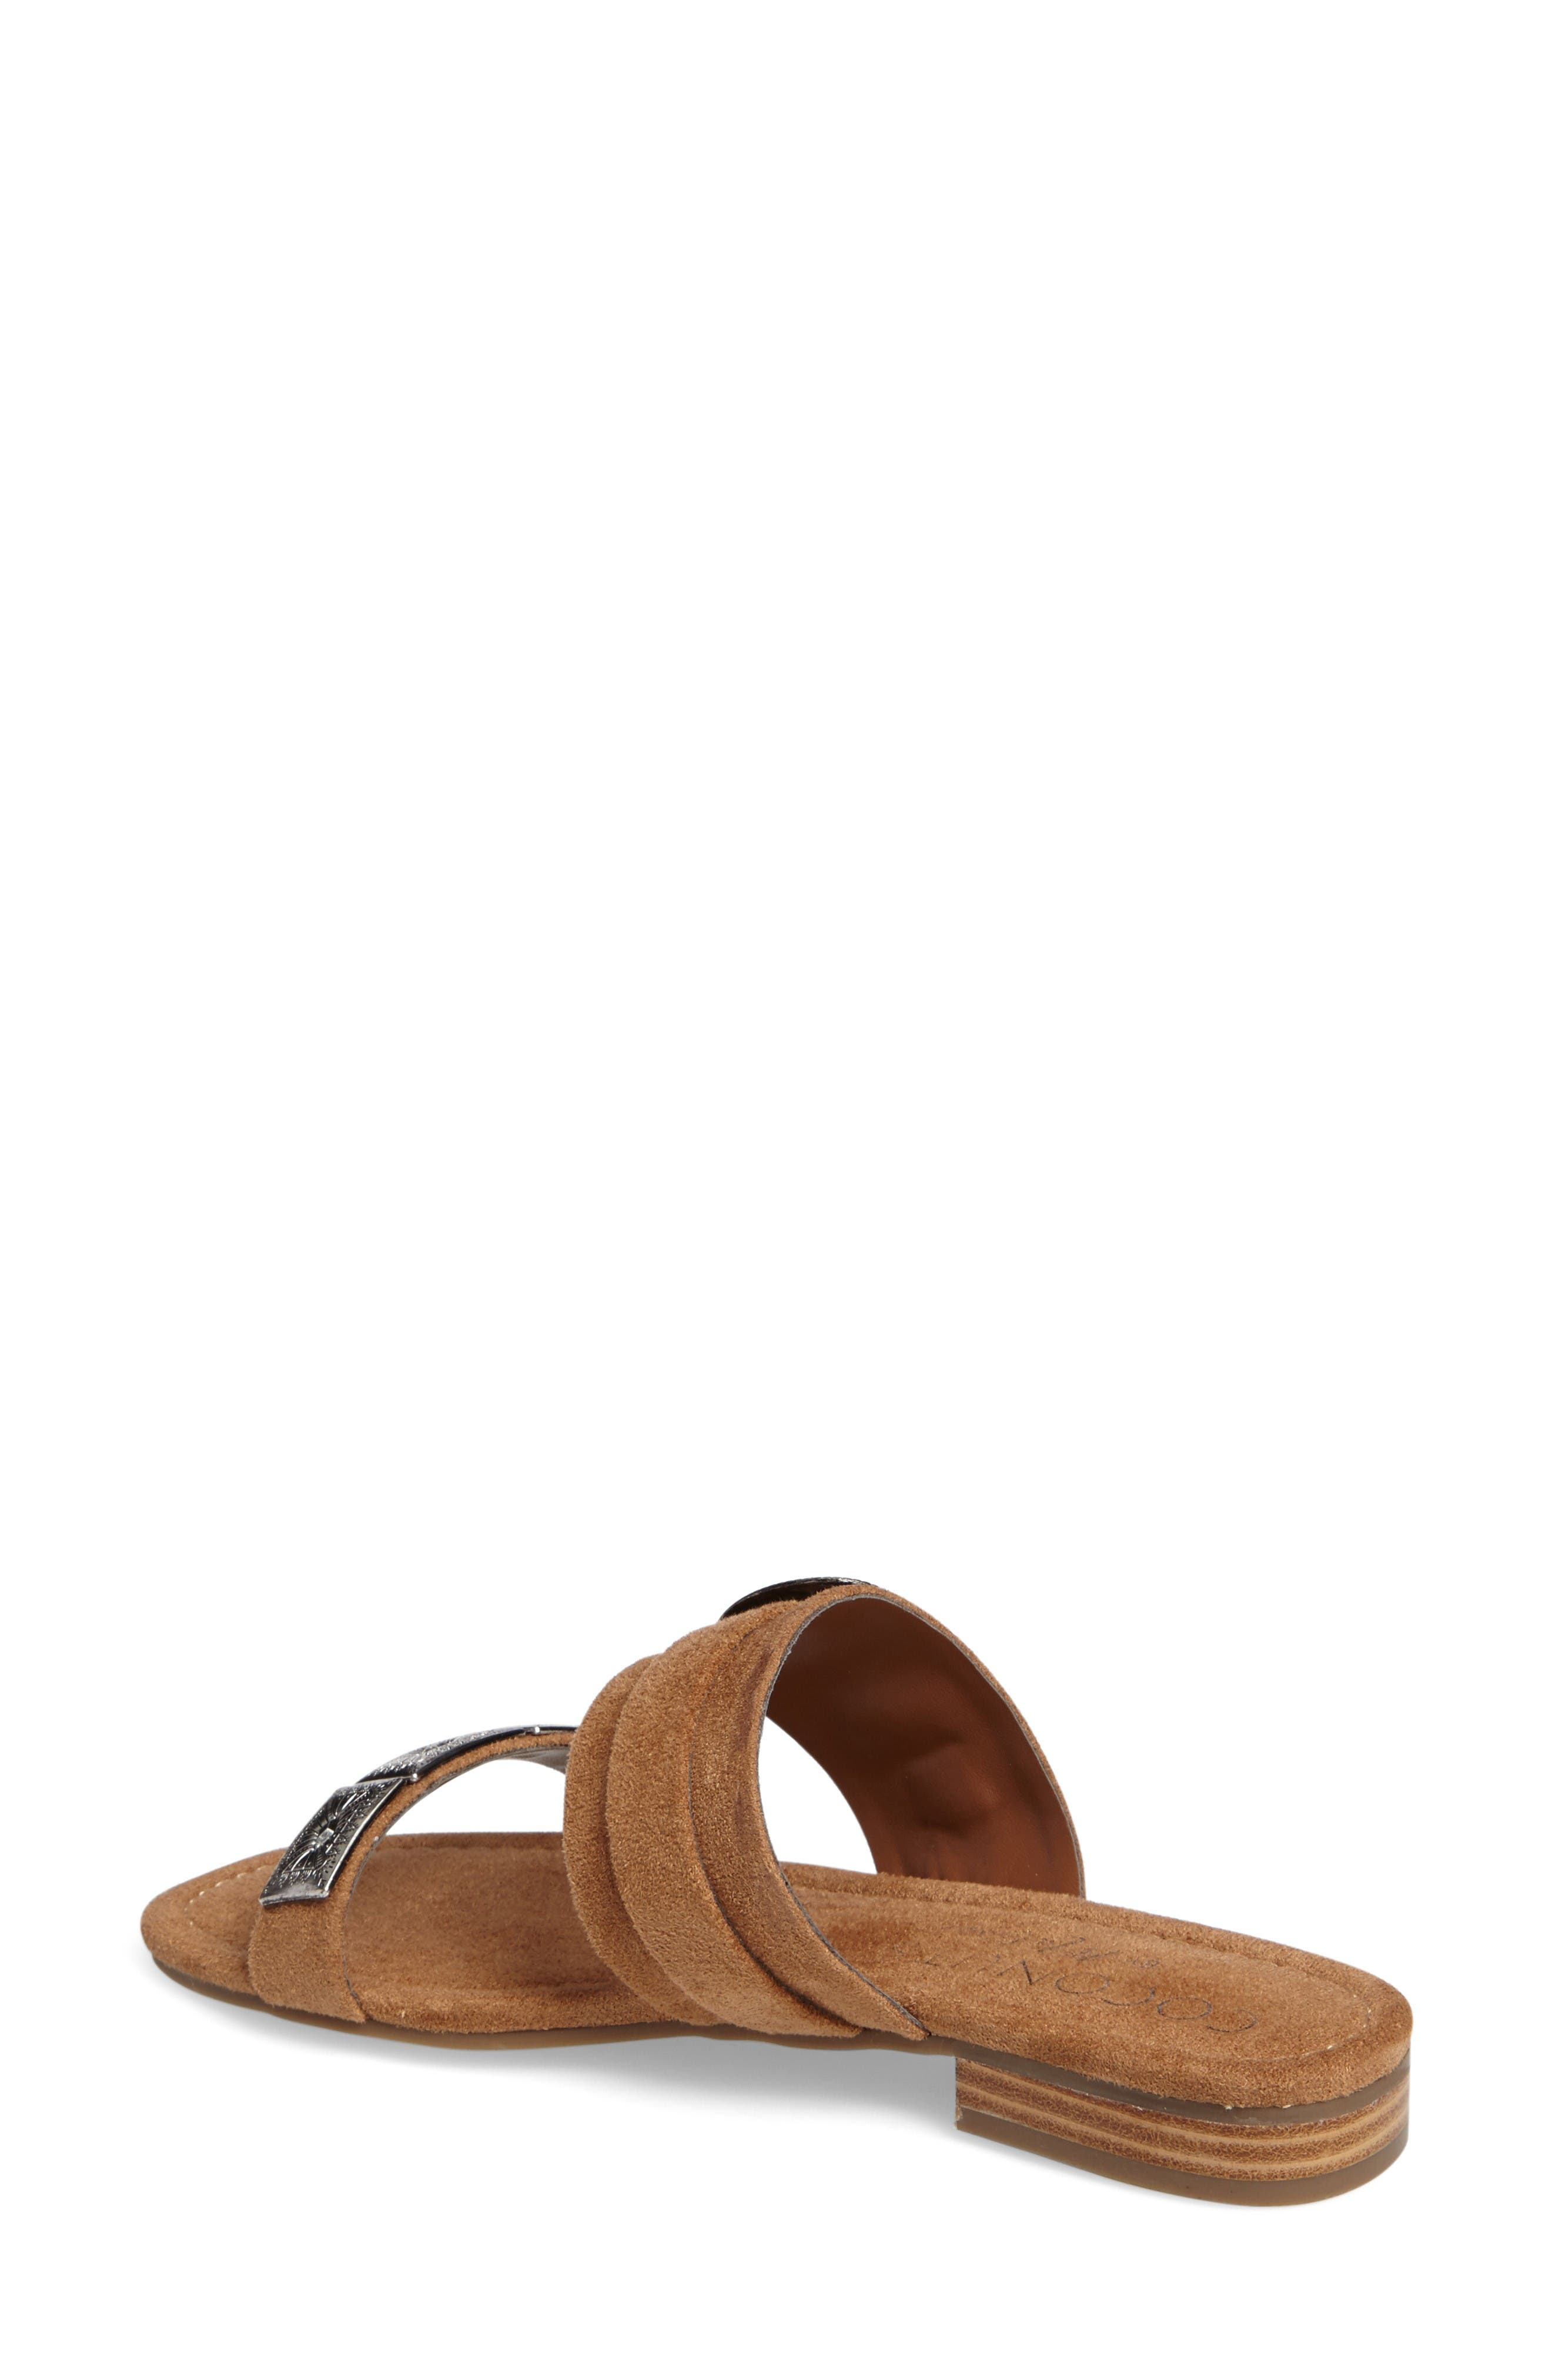 Alternate Image 2  - Matisse Brantley Buckle Slide Sandal (Women)